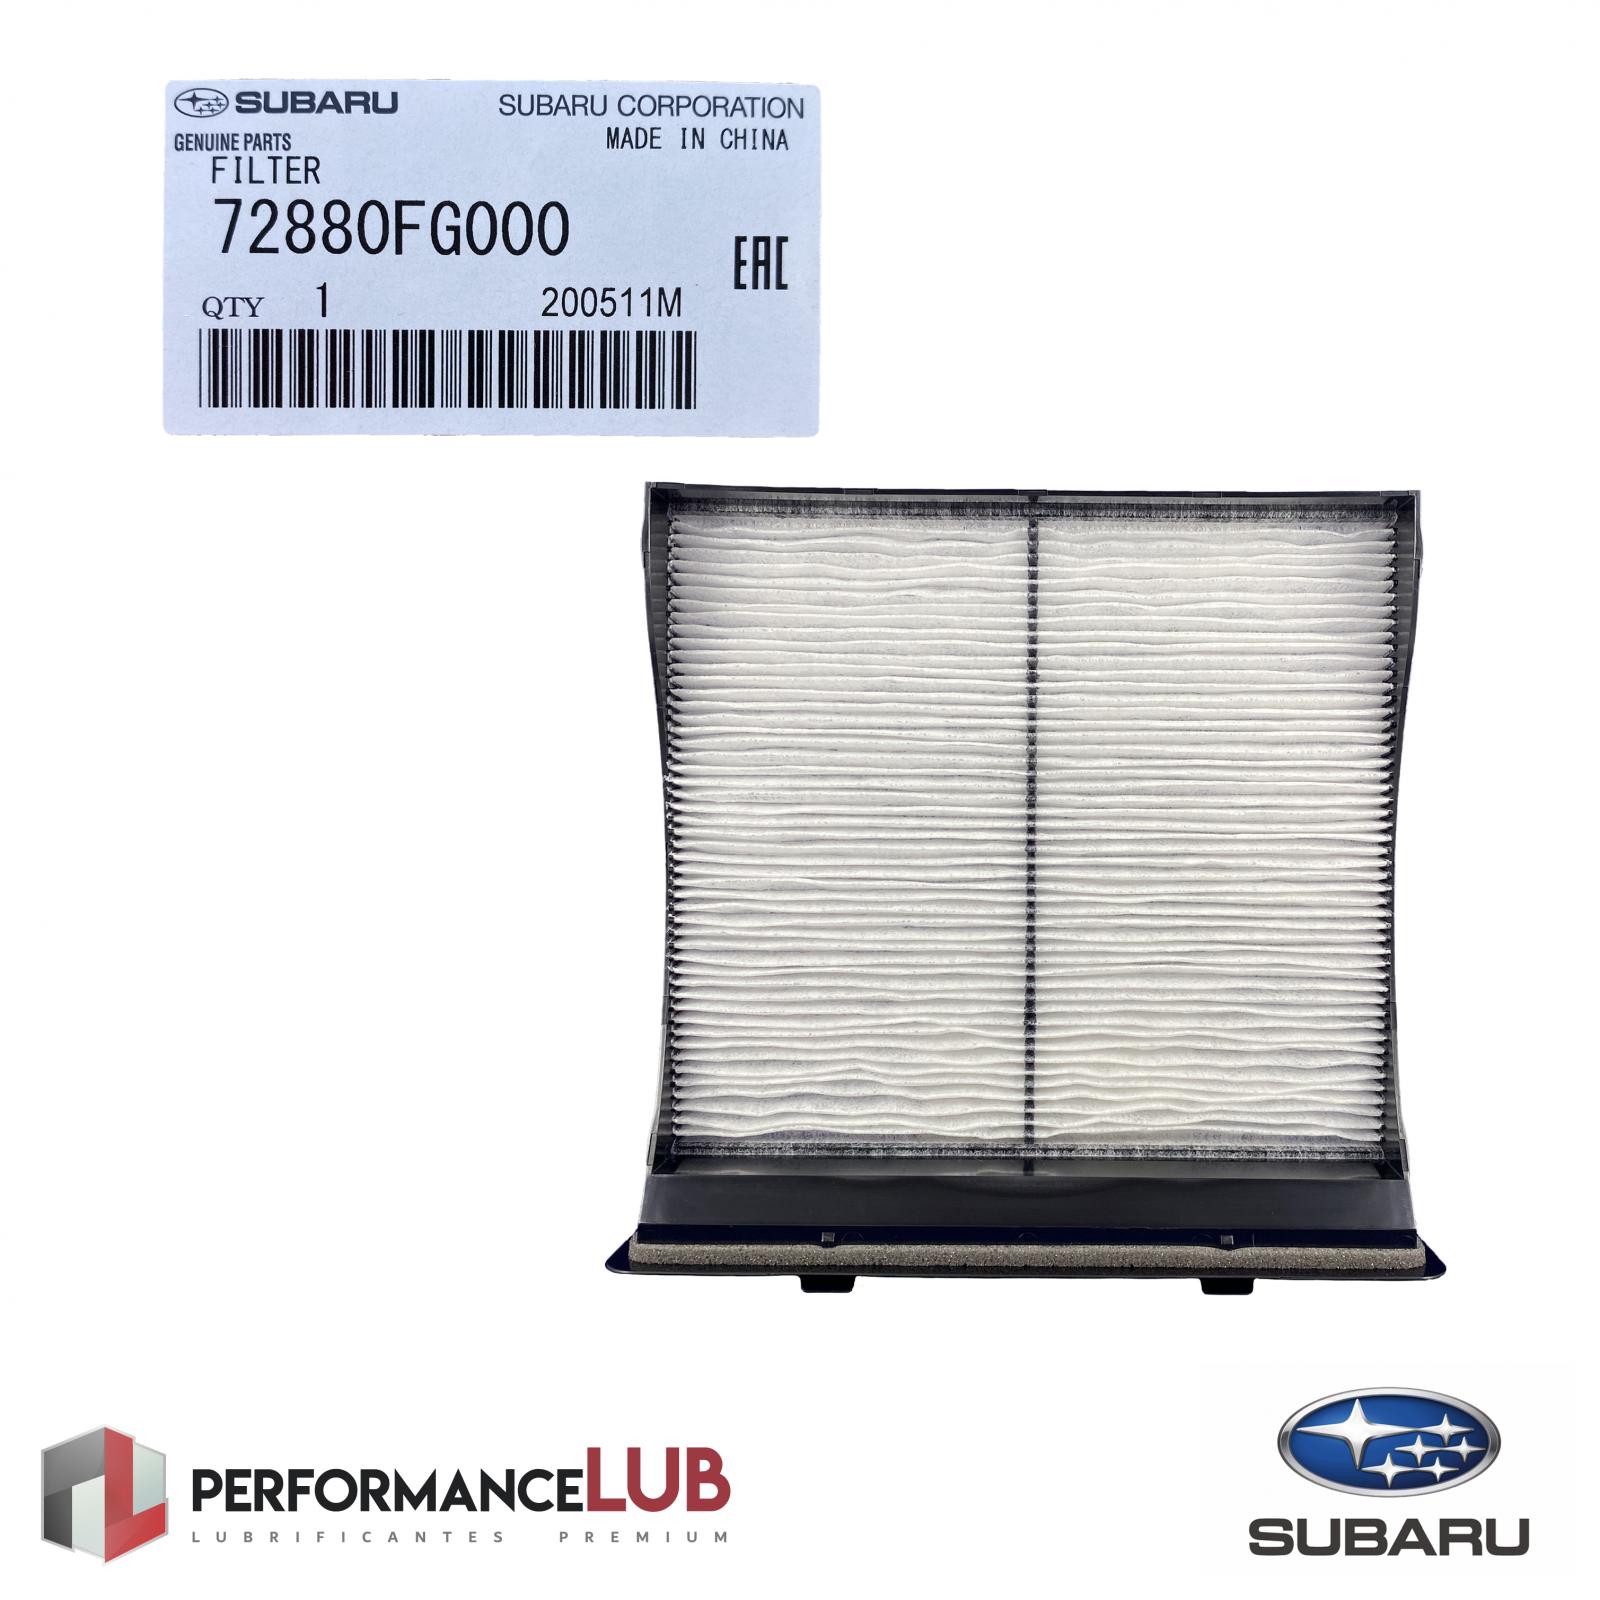 Filtro de ar da cabine - Subaru - 72880FG000 - PerformanceLUB Lubrificantes Premium